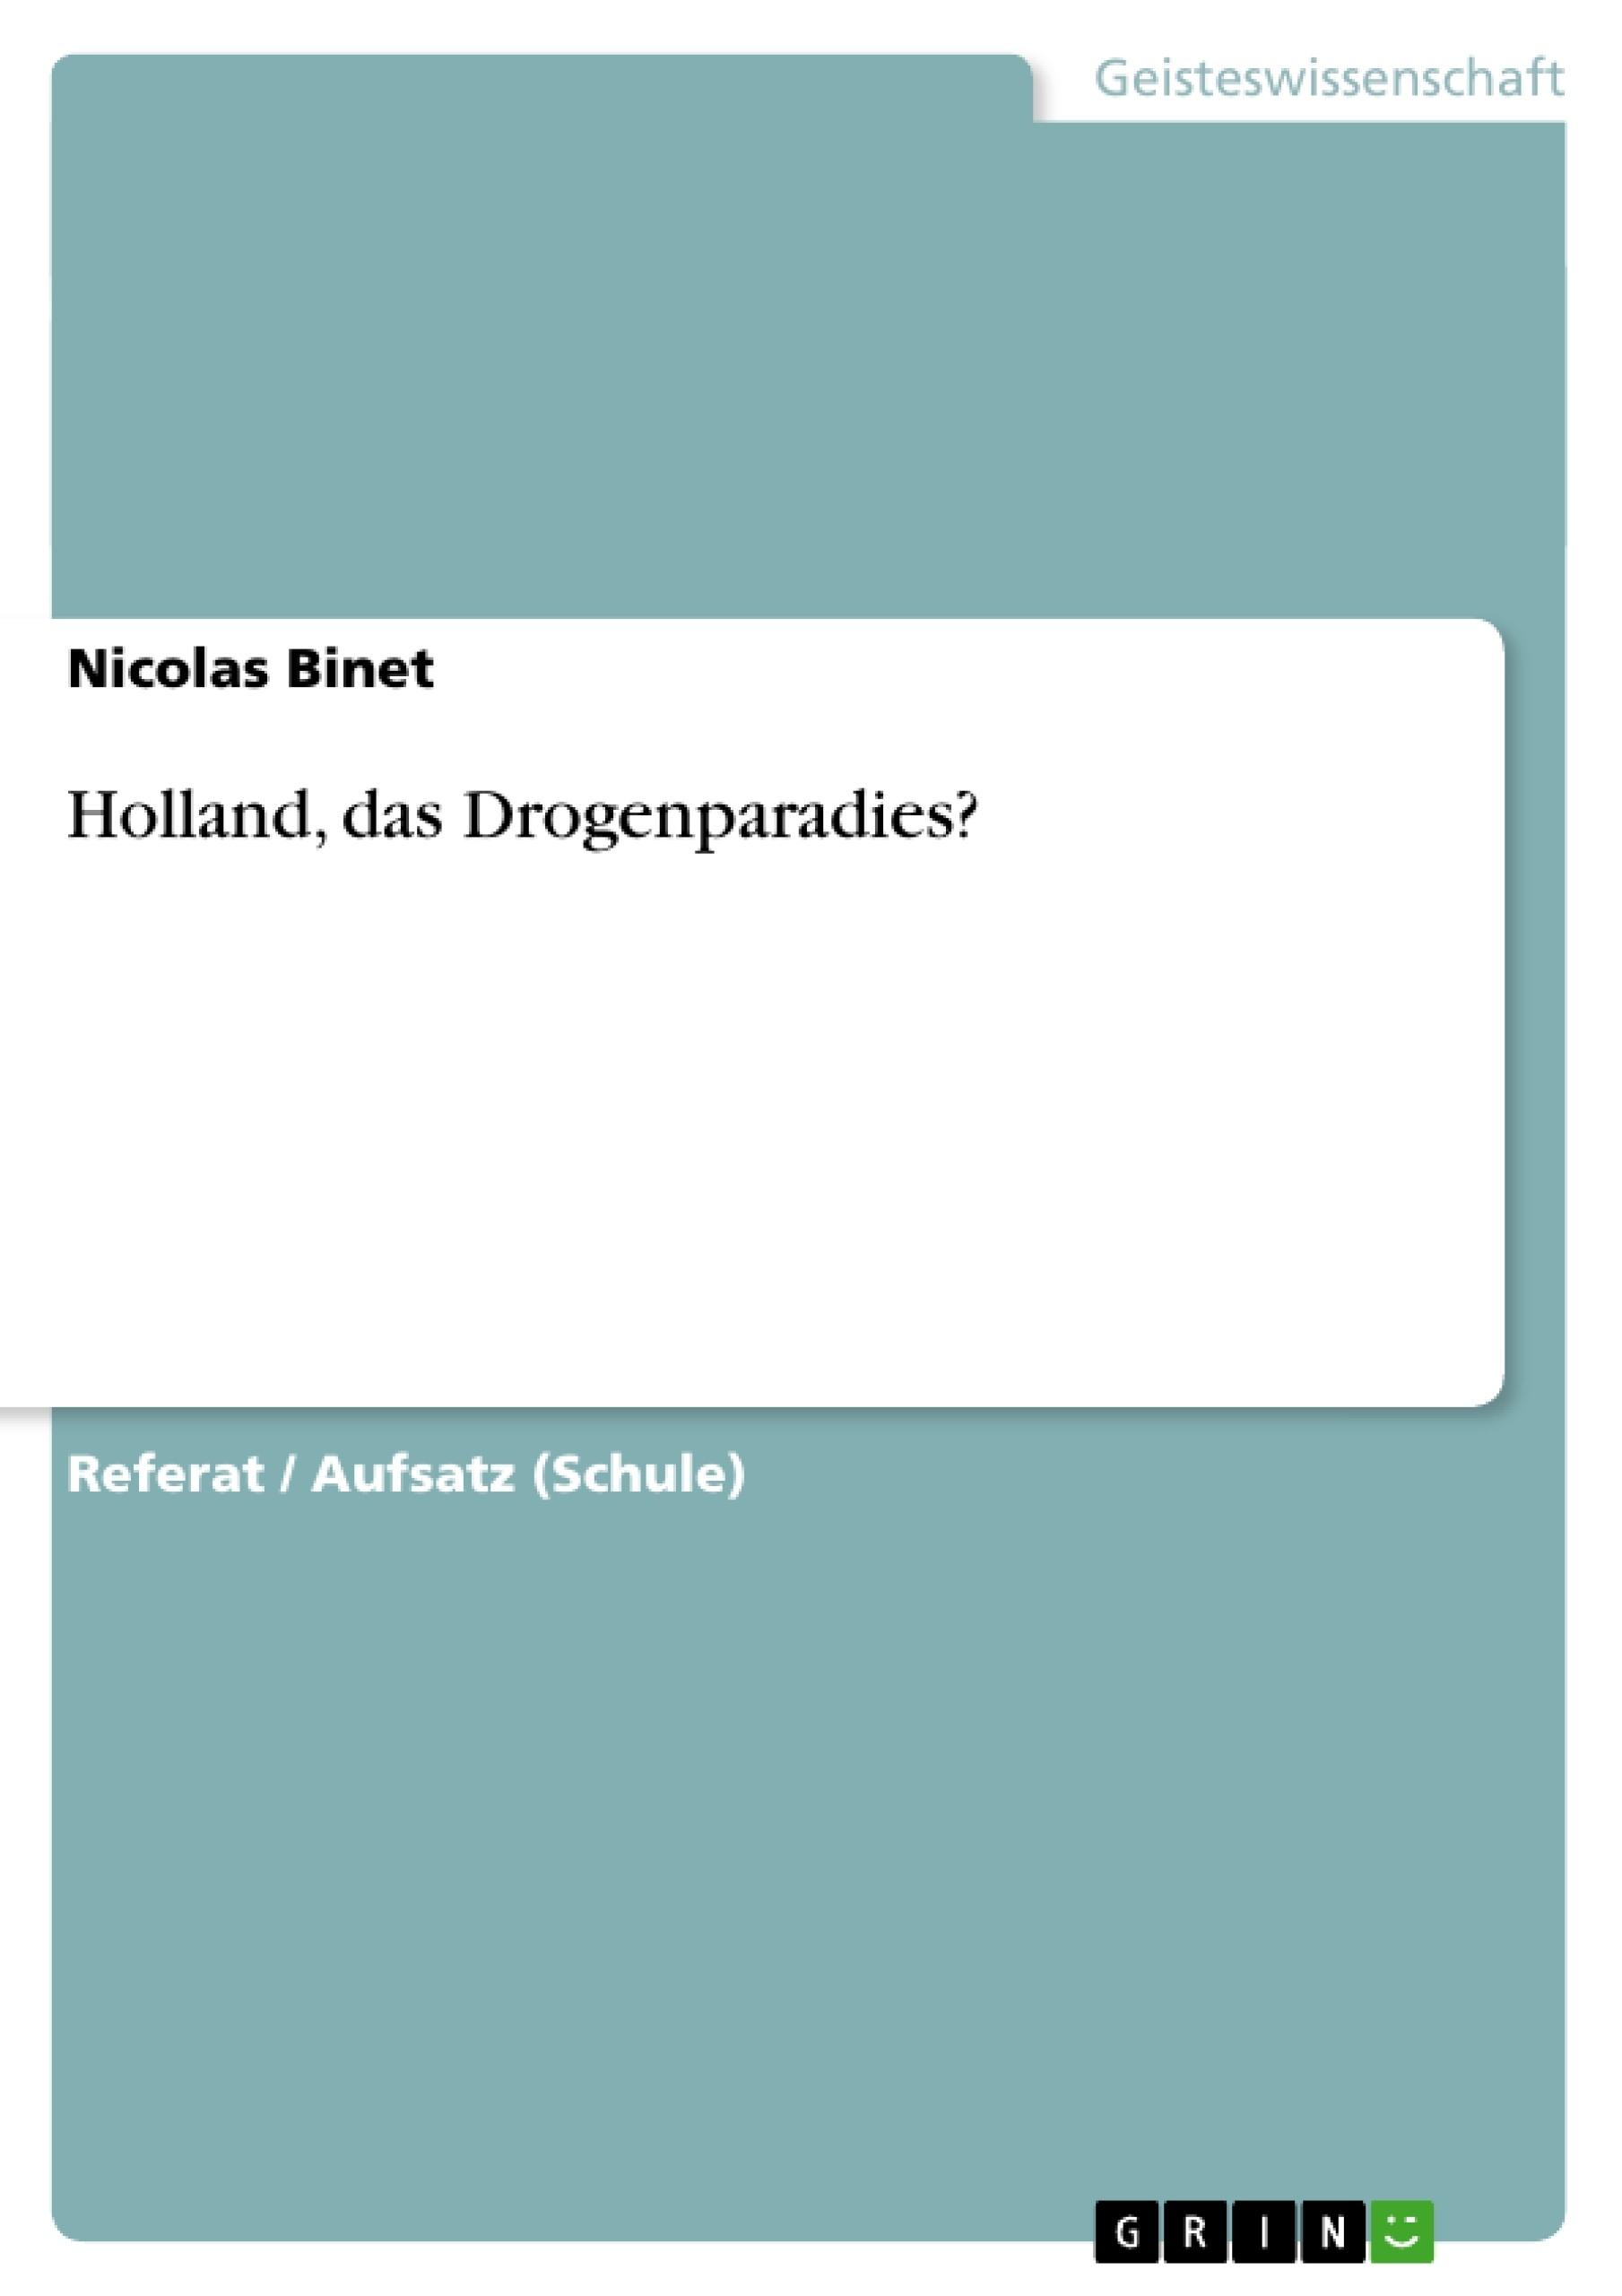 Titel: Holland, das Drogenparadies?